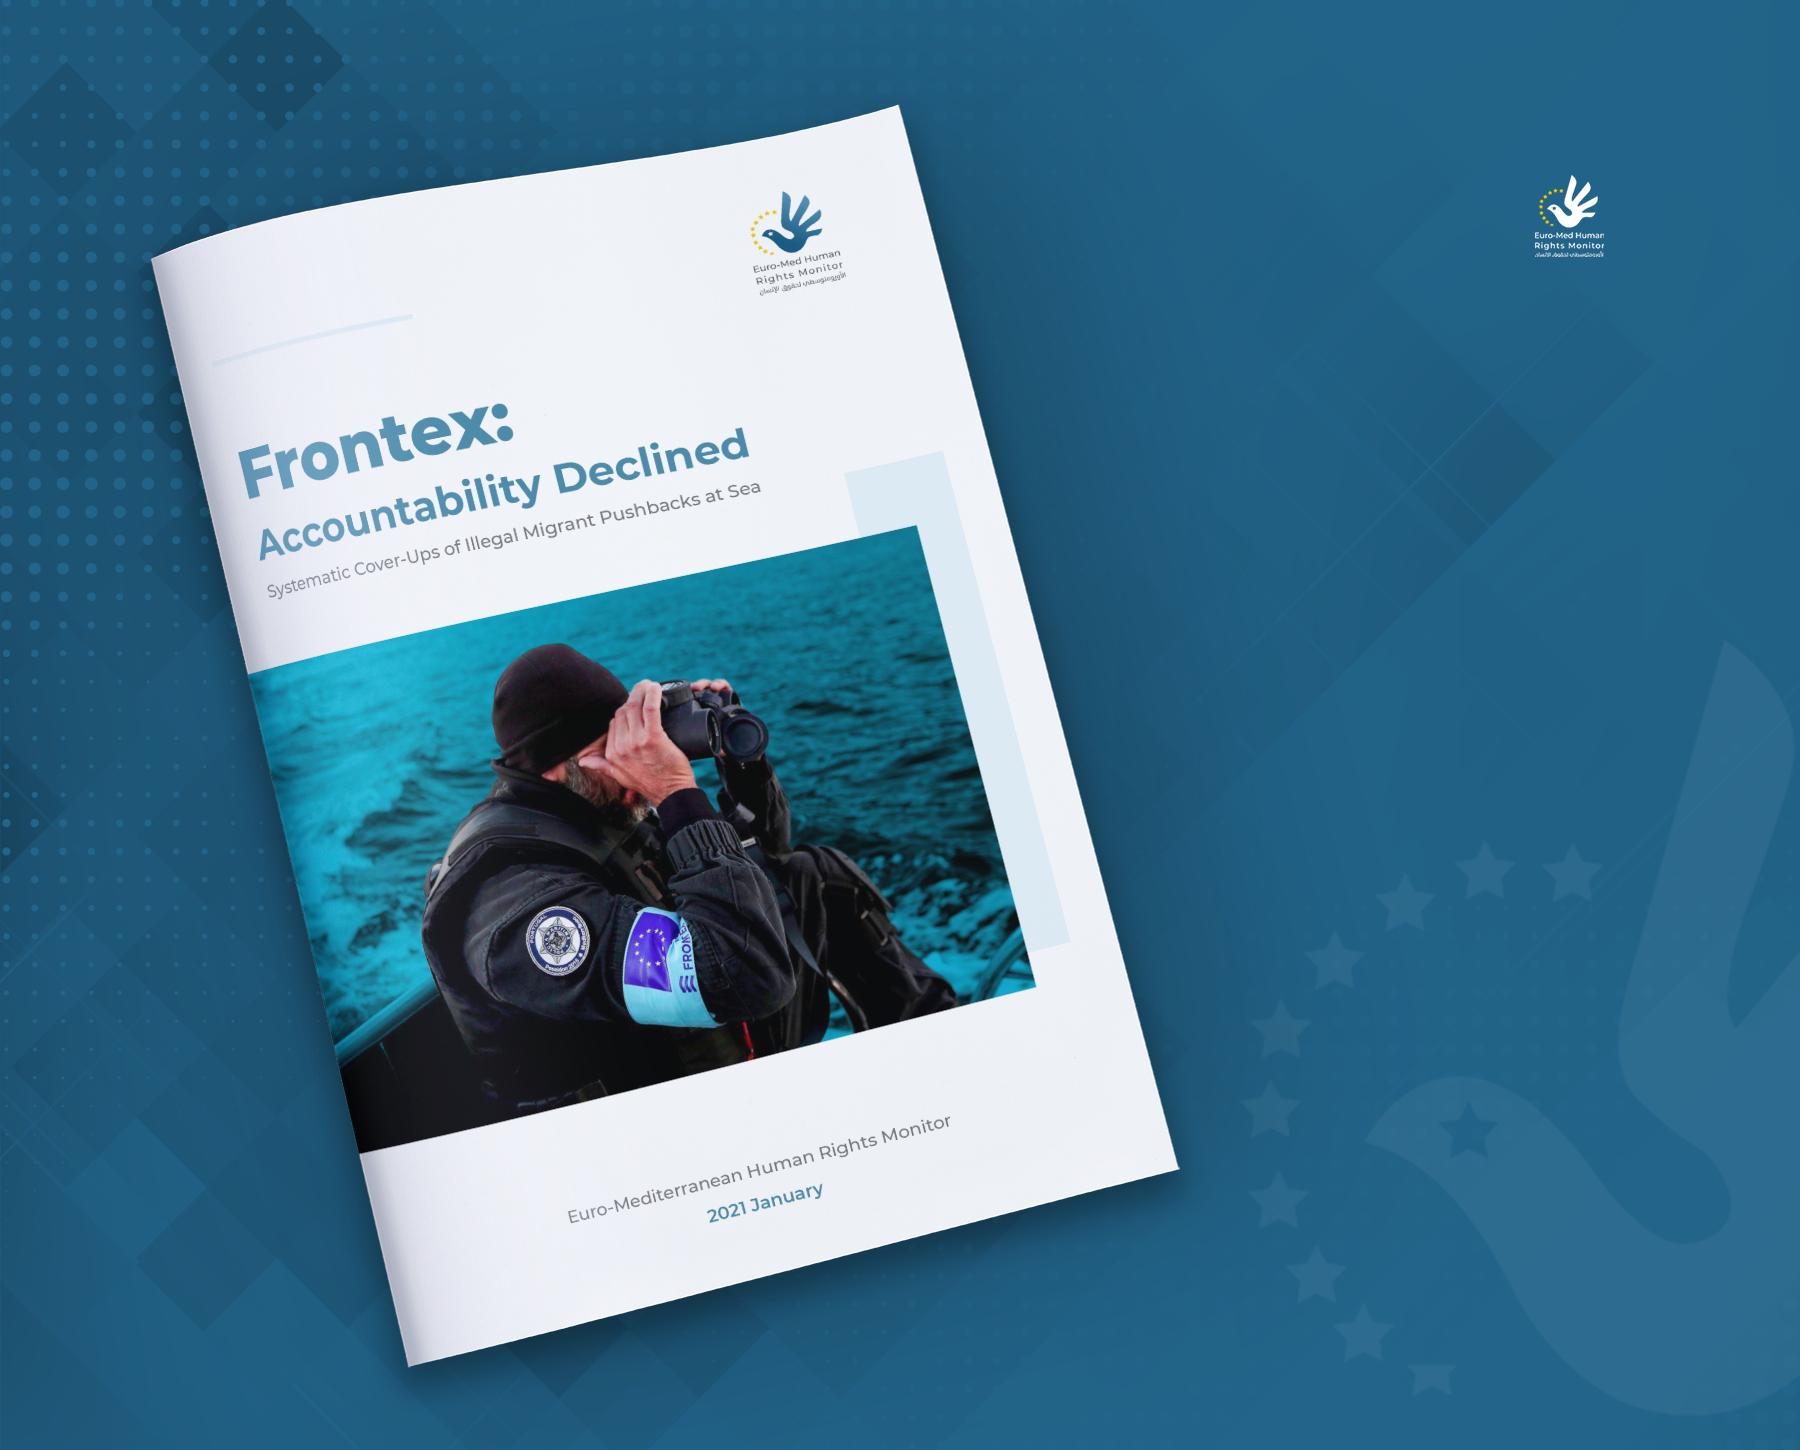 Frontex: Accountability Declined